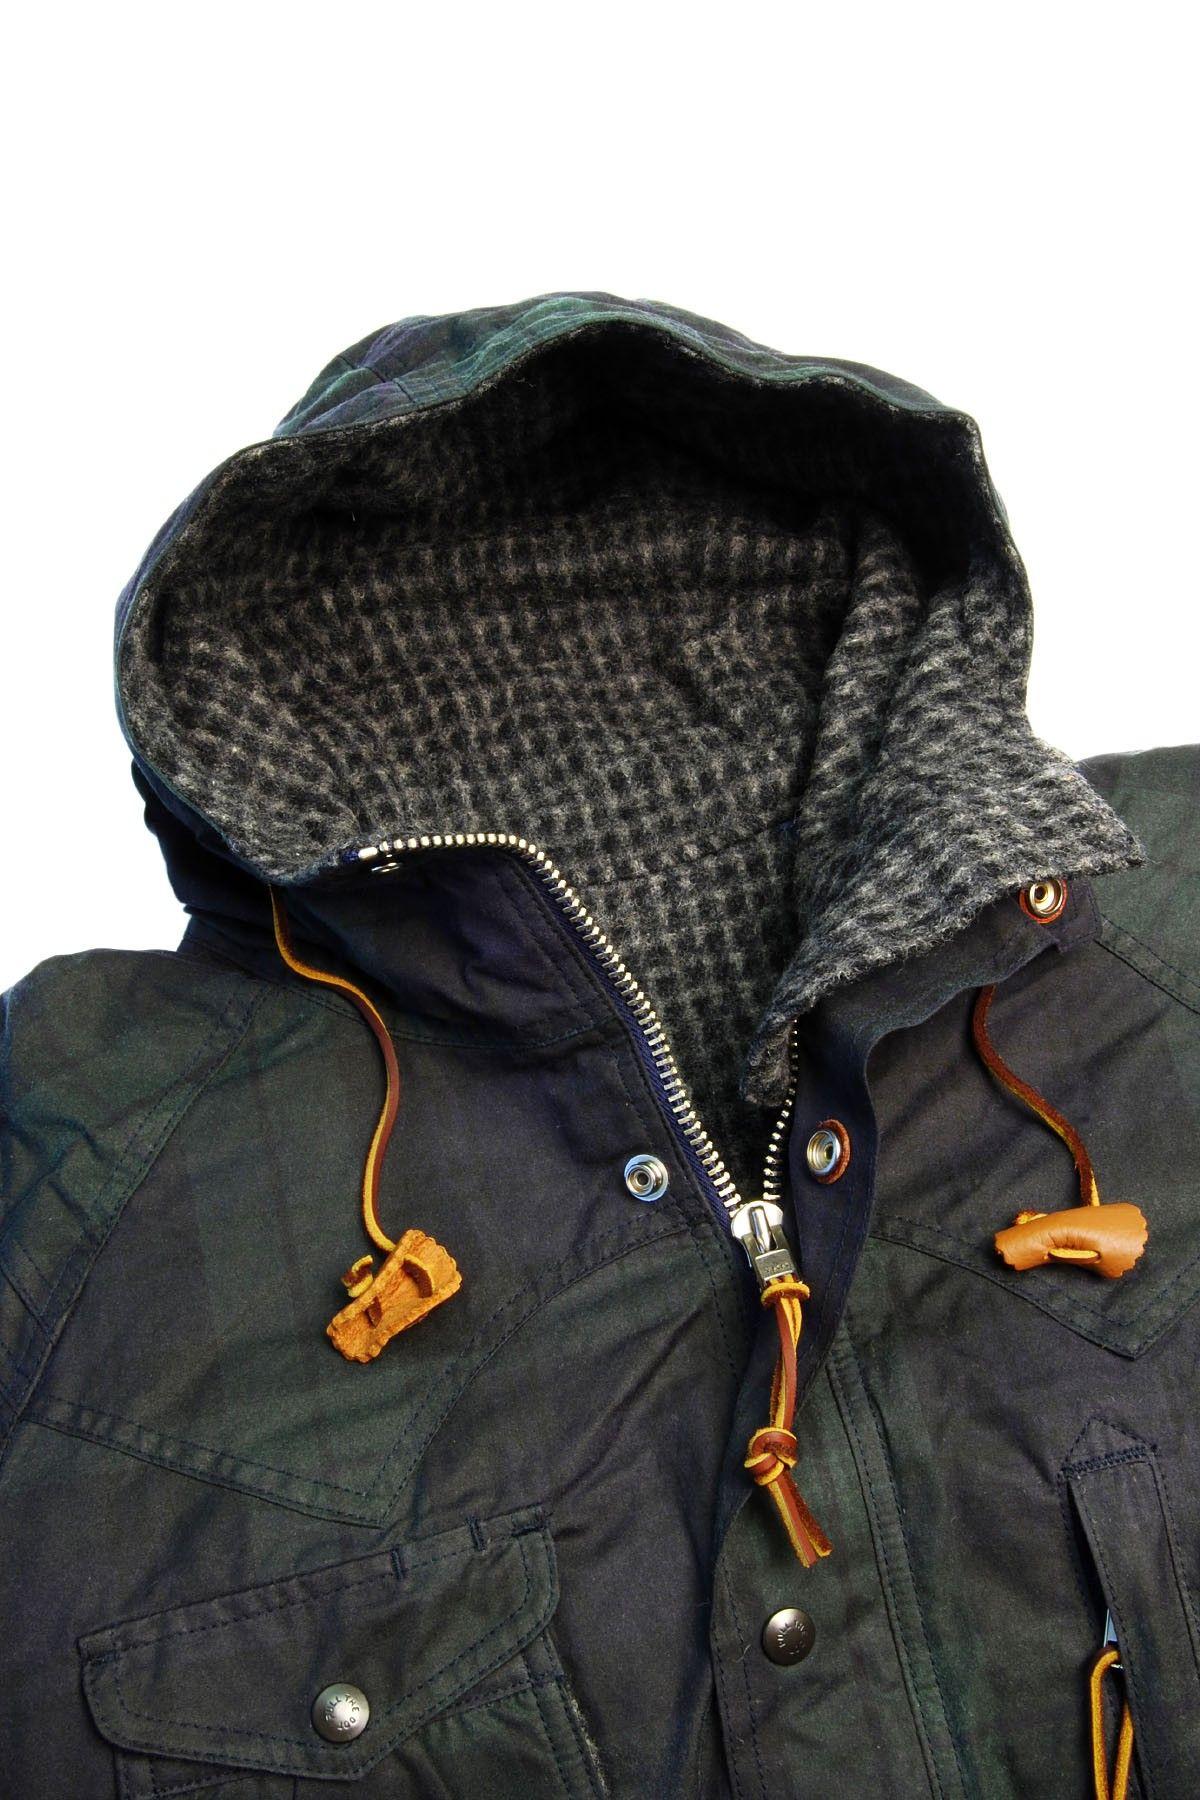 Mountain Parka Waxed Black Watch Monitaly Shop By Brand Outerwear Details Black Watch Parka [ 1800 x 1200 Pixel ]